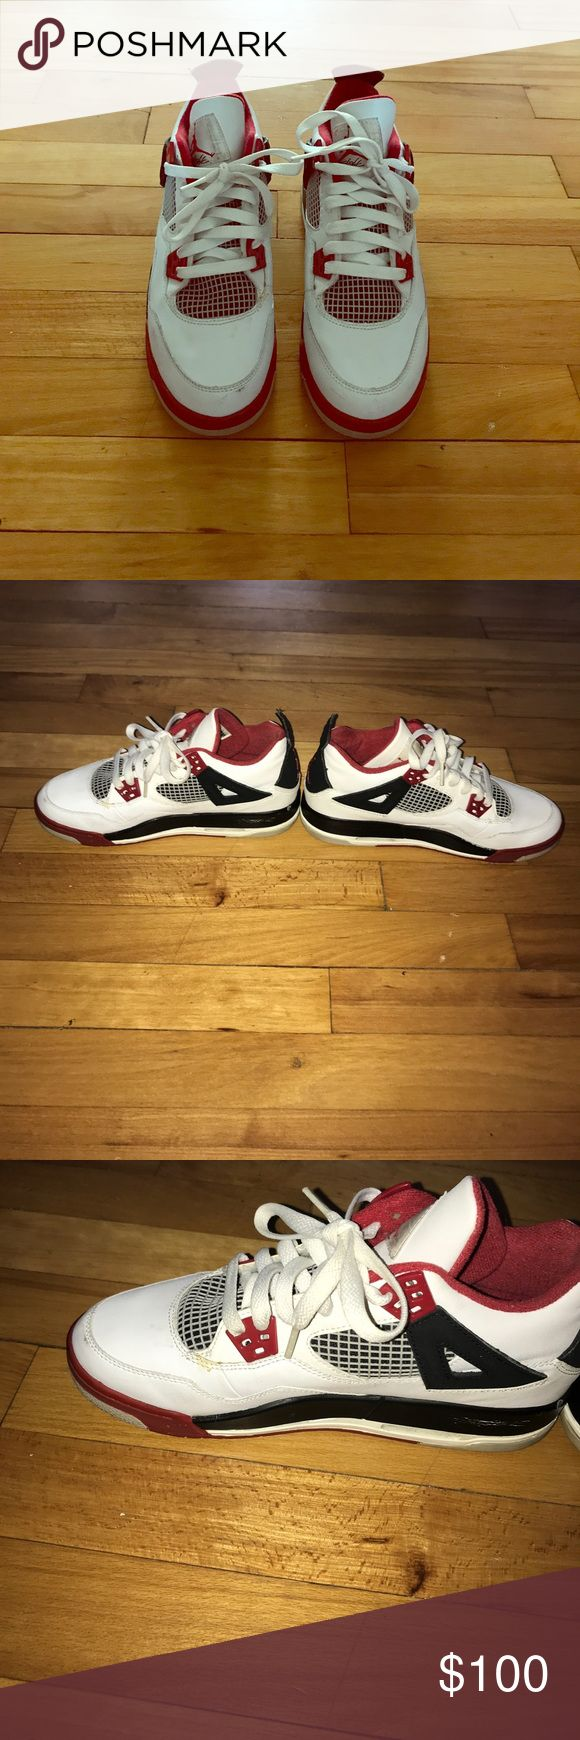 Retro 4 Spike Lee Edition Jordan Worn Youth Jordan's with new shoe strings Jordan Shoes Sneakers